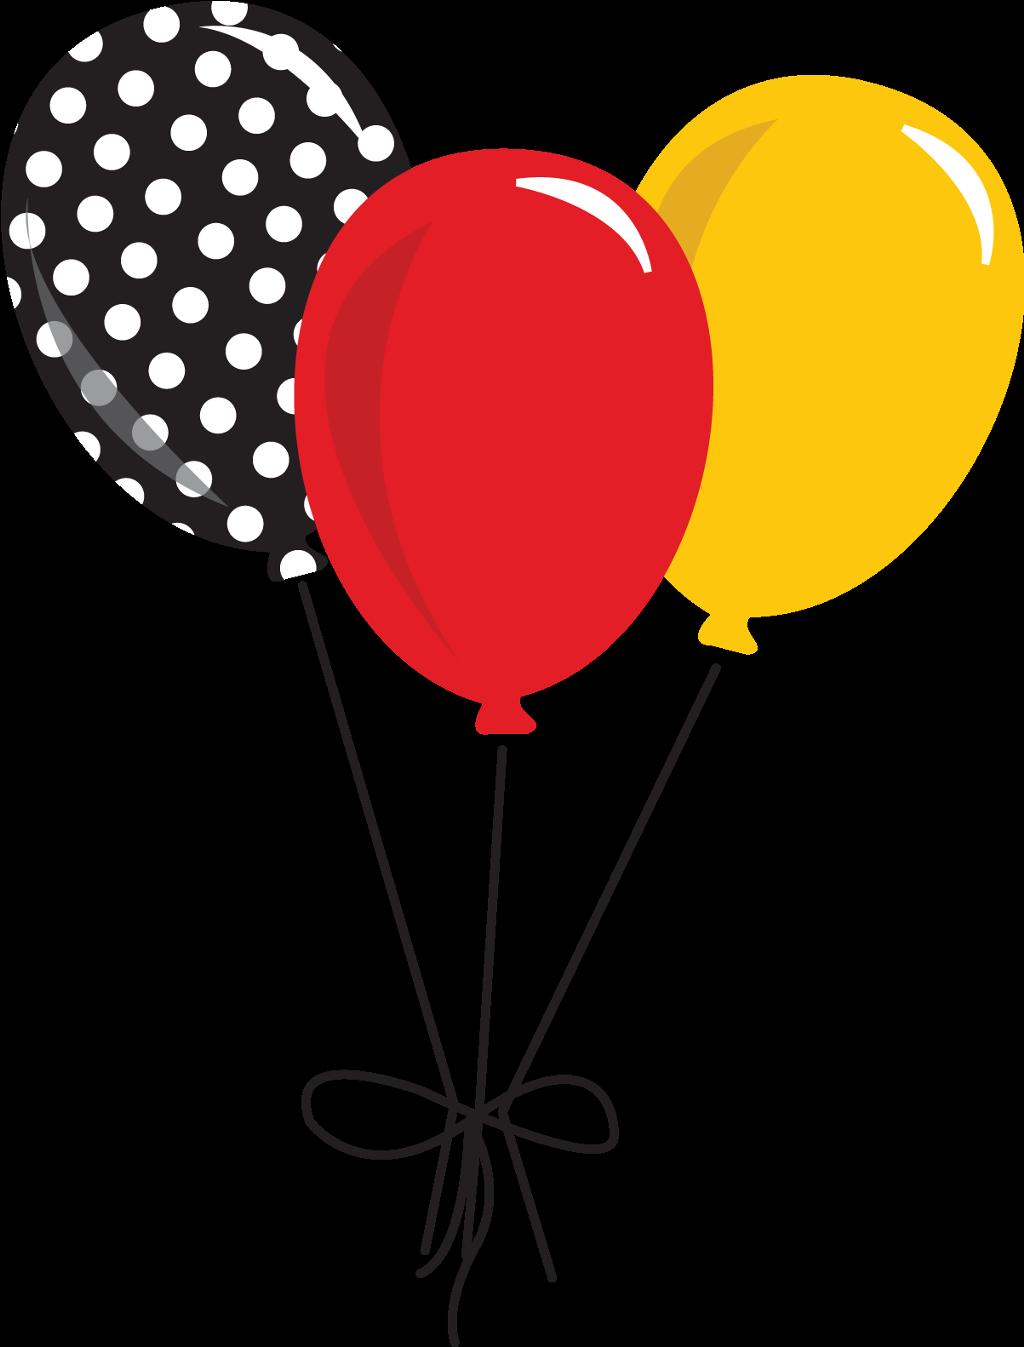 balloons polkadots red yellow black png clipart.